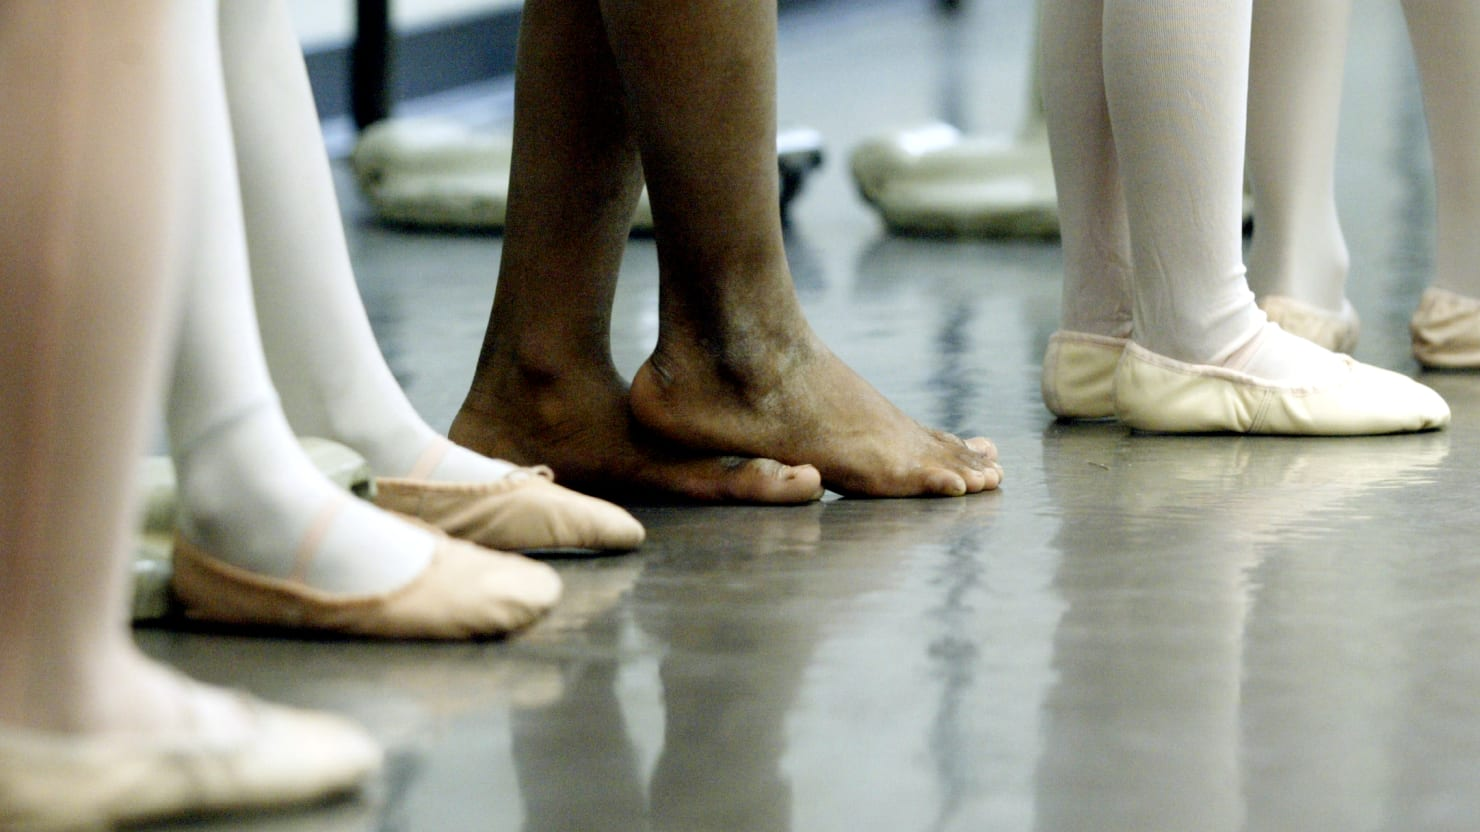 New York City Ballet Leader Who Left Amid Sex Allegations 'Still Visits Backstage'